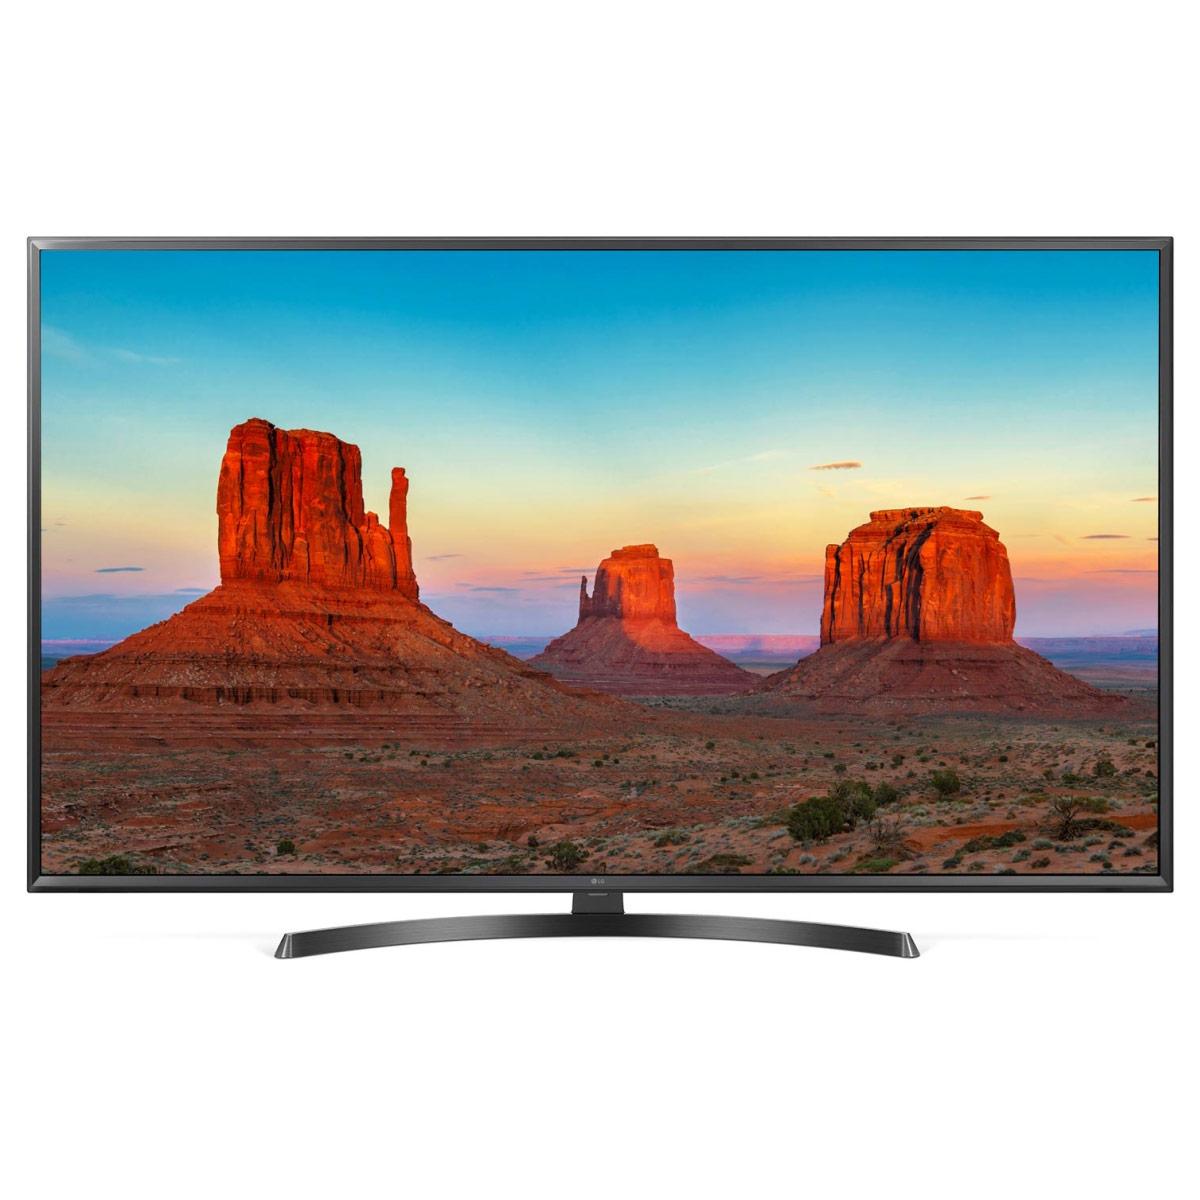 "TV LG 65UK6470 Téléviseur LED 4K 65"" (165 cm) 16/9 - 3840 x 2160 pixels - Ultra HD 2160p - HDR - Wi-Fi - Bluetooth - 1600 Hz"